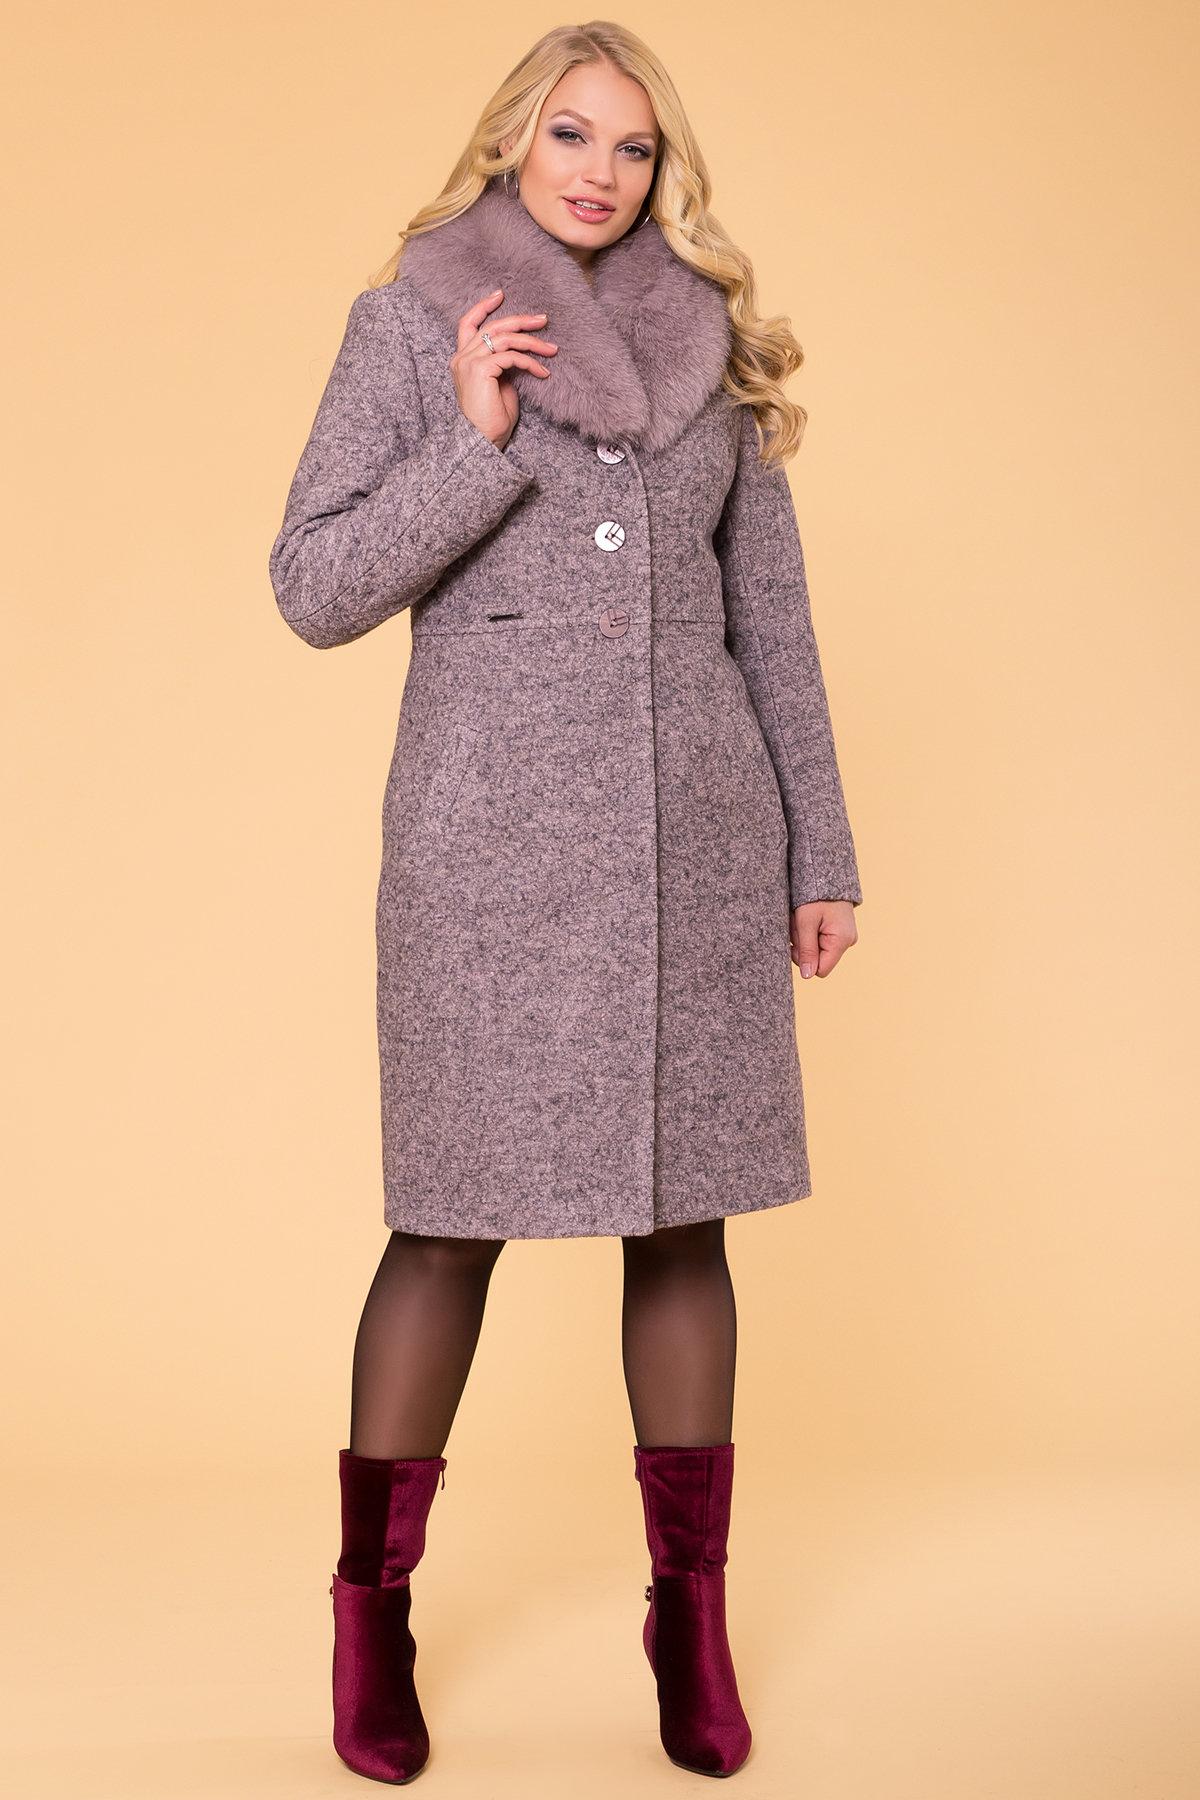 Пальто зима Габриэлла Donna 6048 Цвет: Серо-розовый LW-25